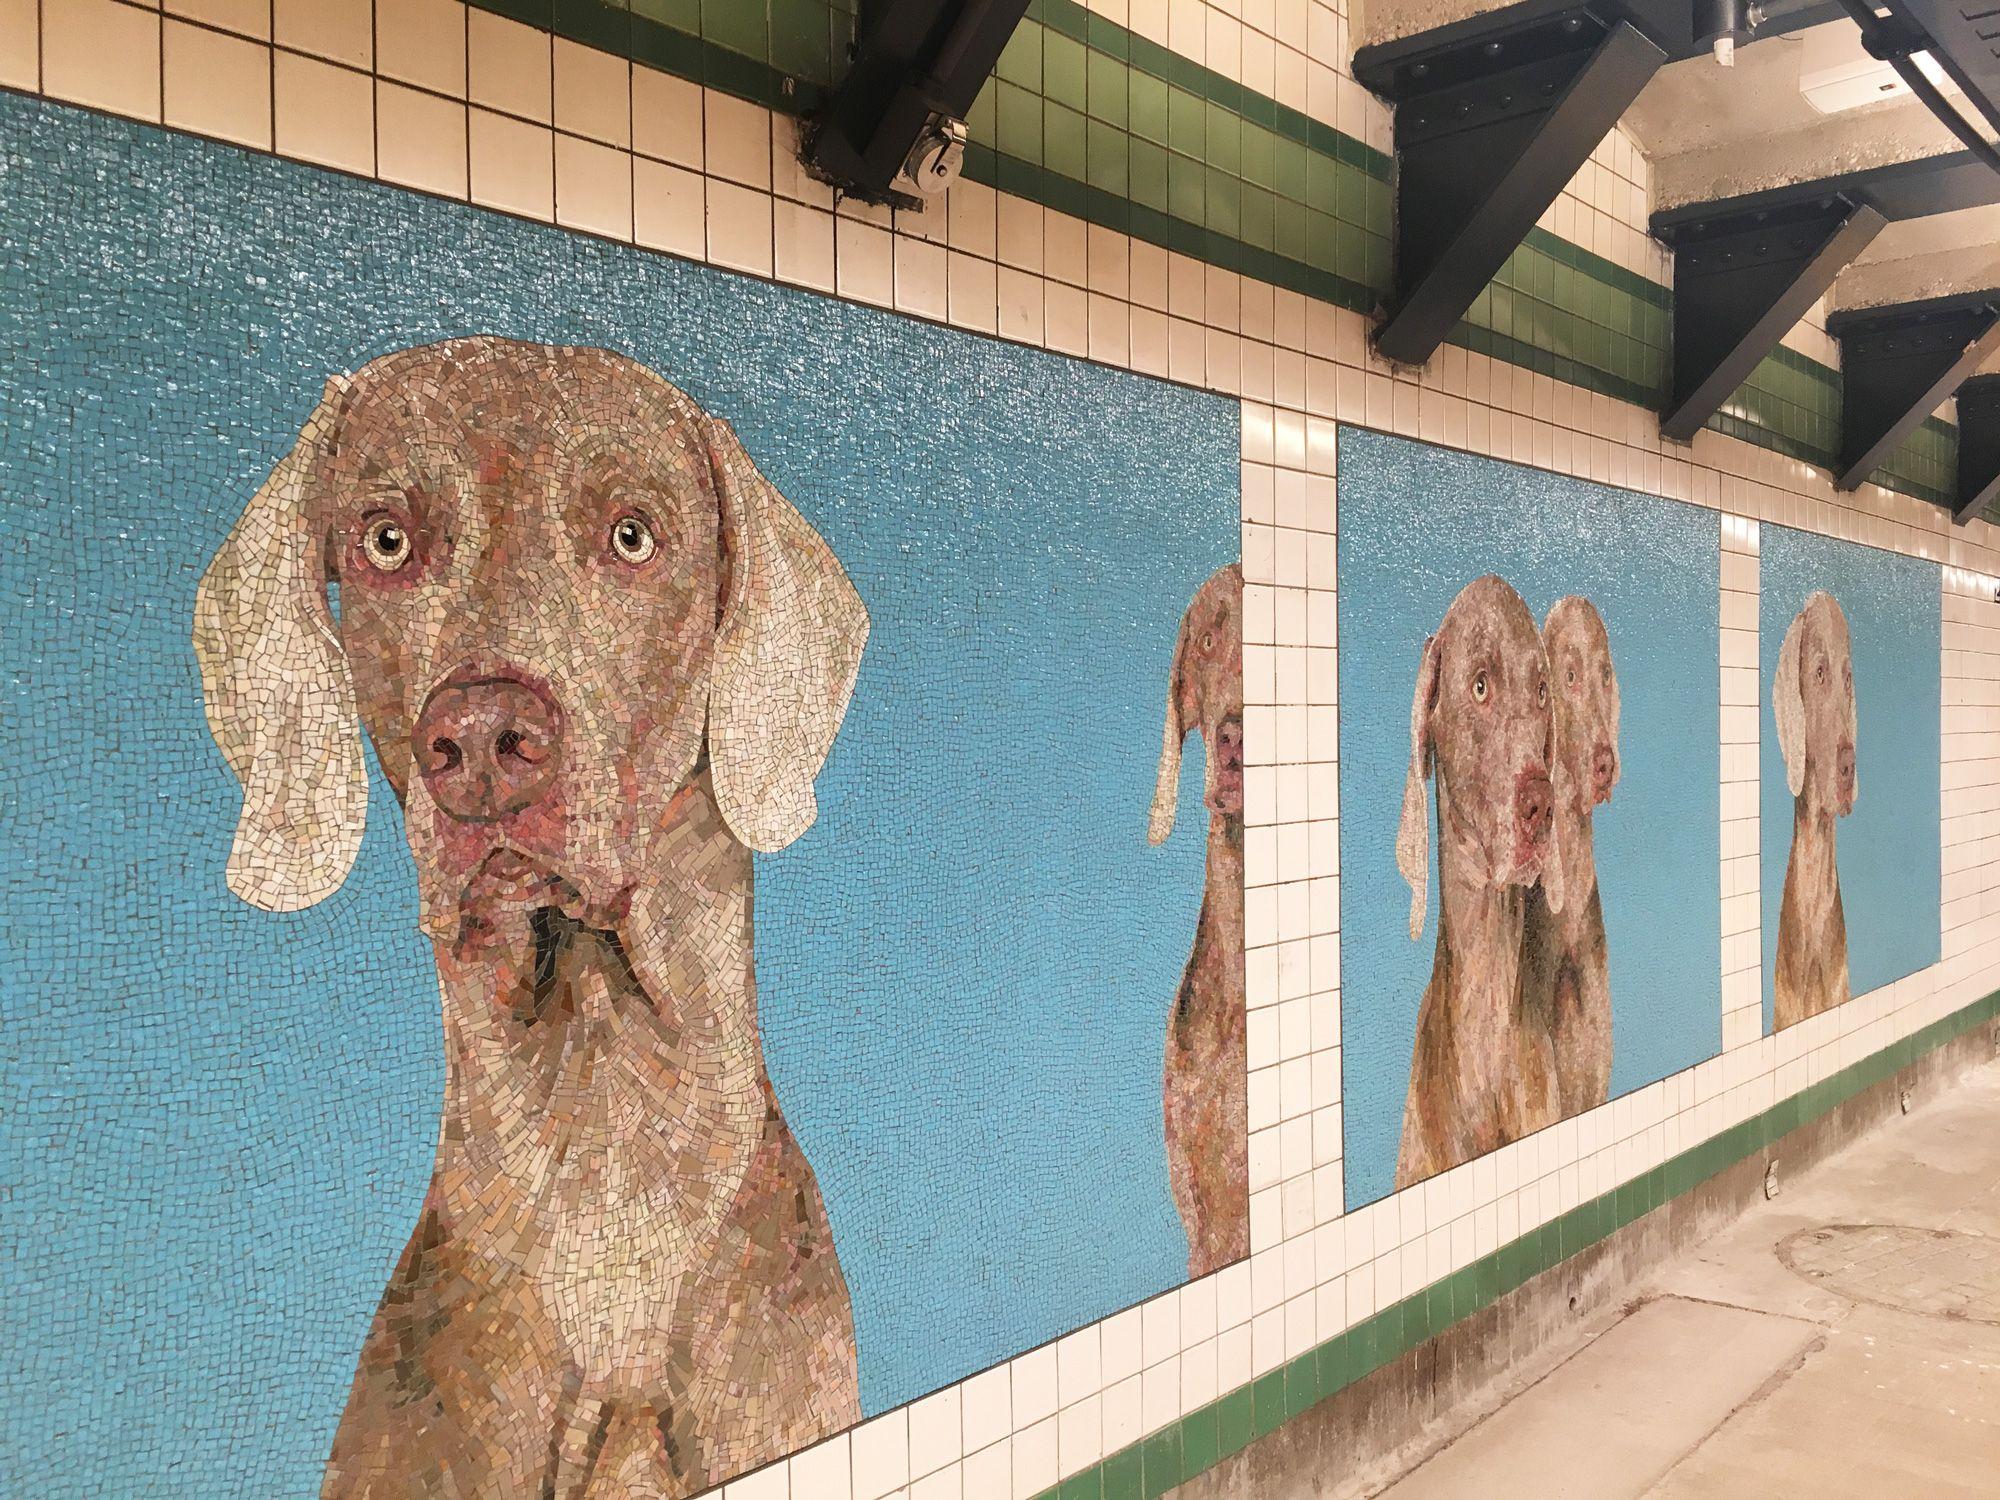 Wegman Murals Cheer Up Reopened 23rd St F M Station Subway Art